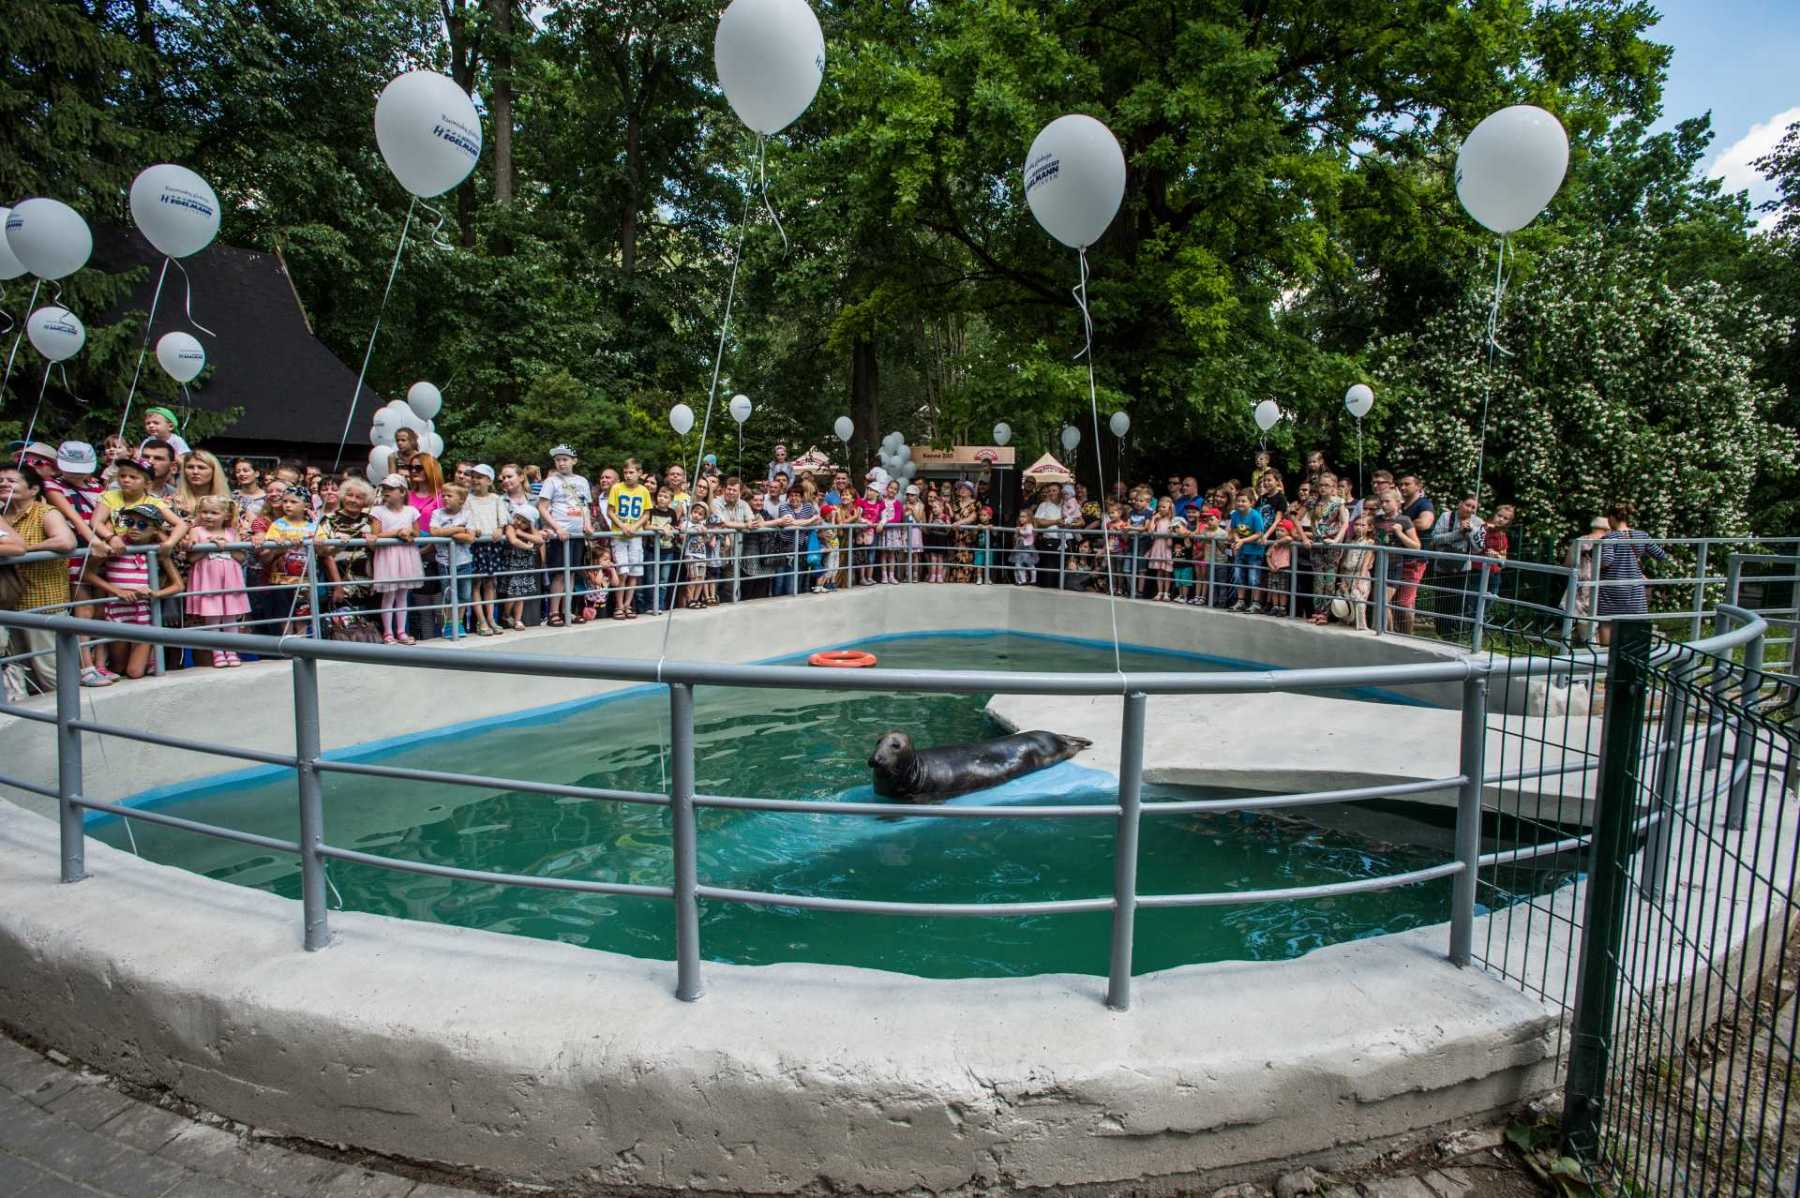 Baltic grey seal. Lithuania, 2016. JMcArthur / Born Free Foundation